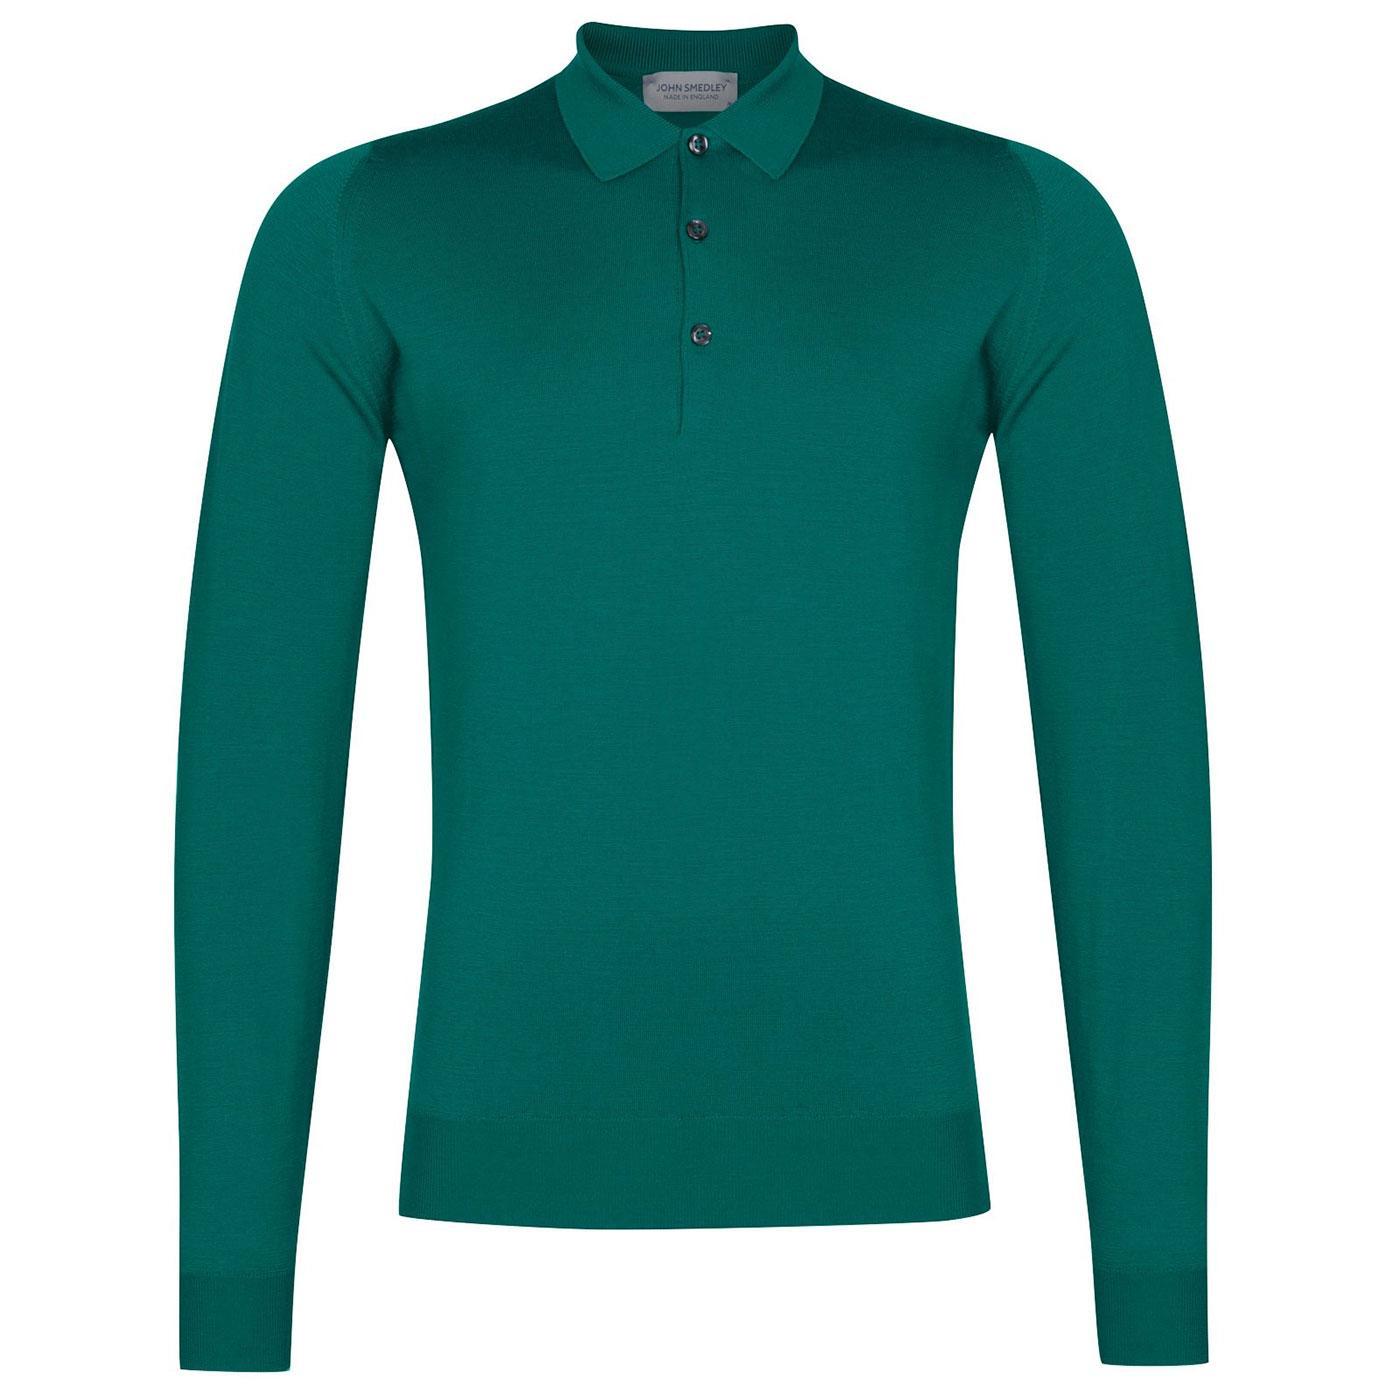 Belper JOHN SMEDLEY 60's Knitted Mod Polo Shirt LG